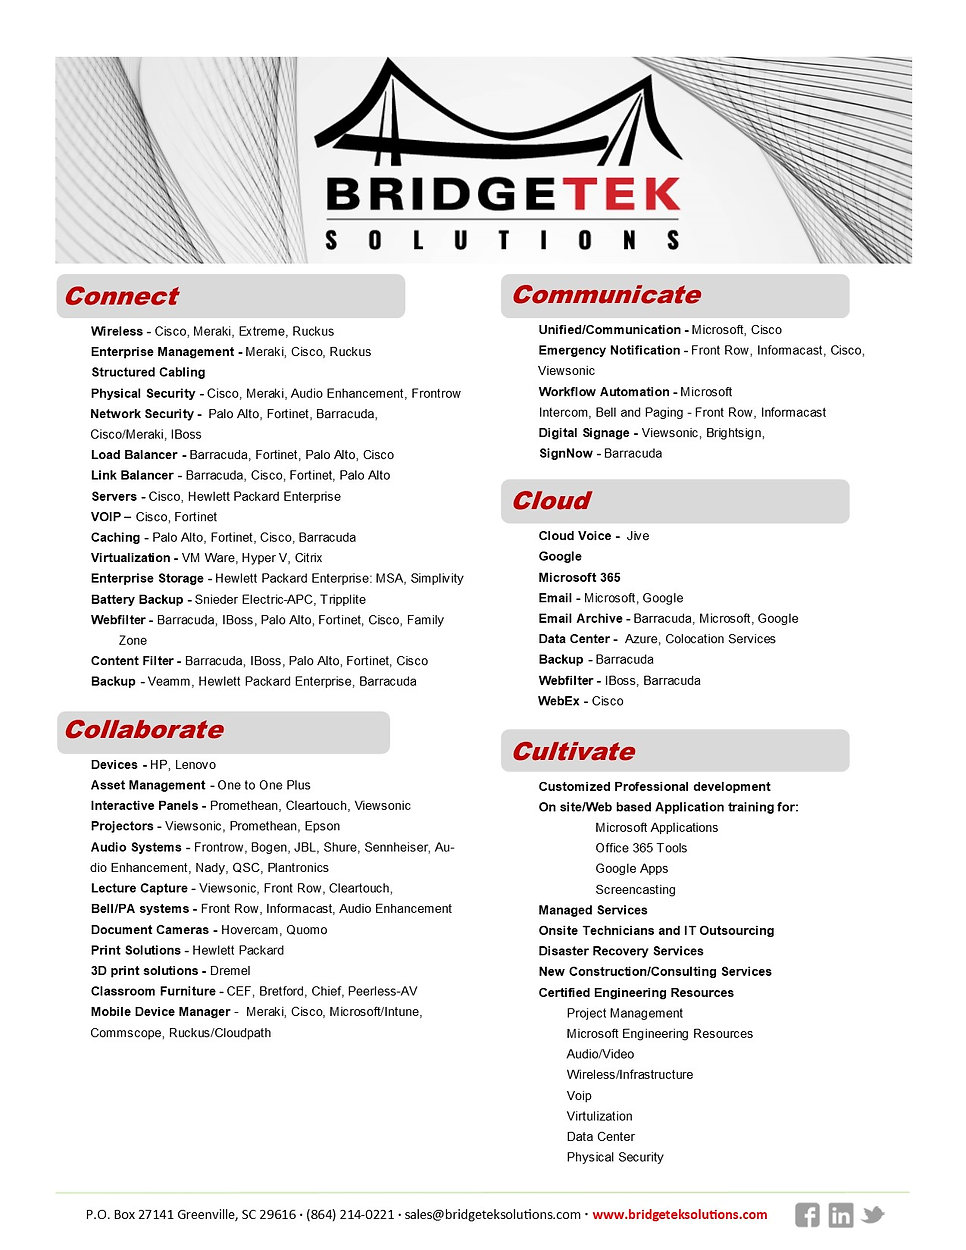 Bridgetek Line Card 2020 list.jpg